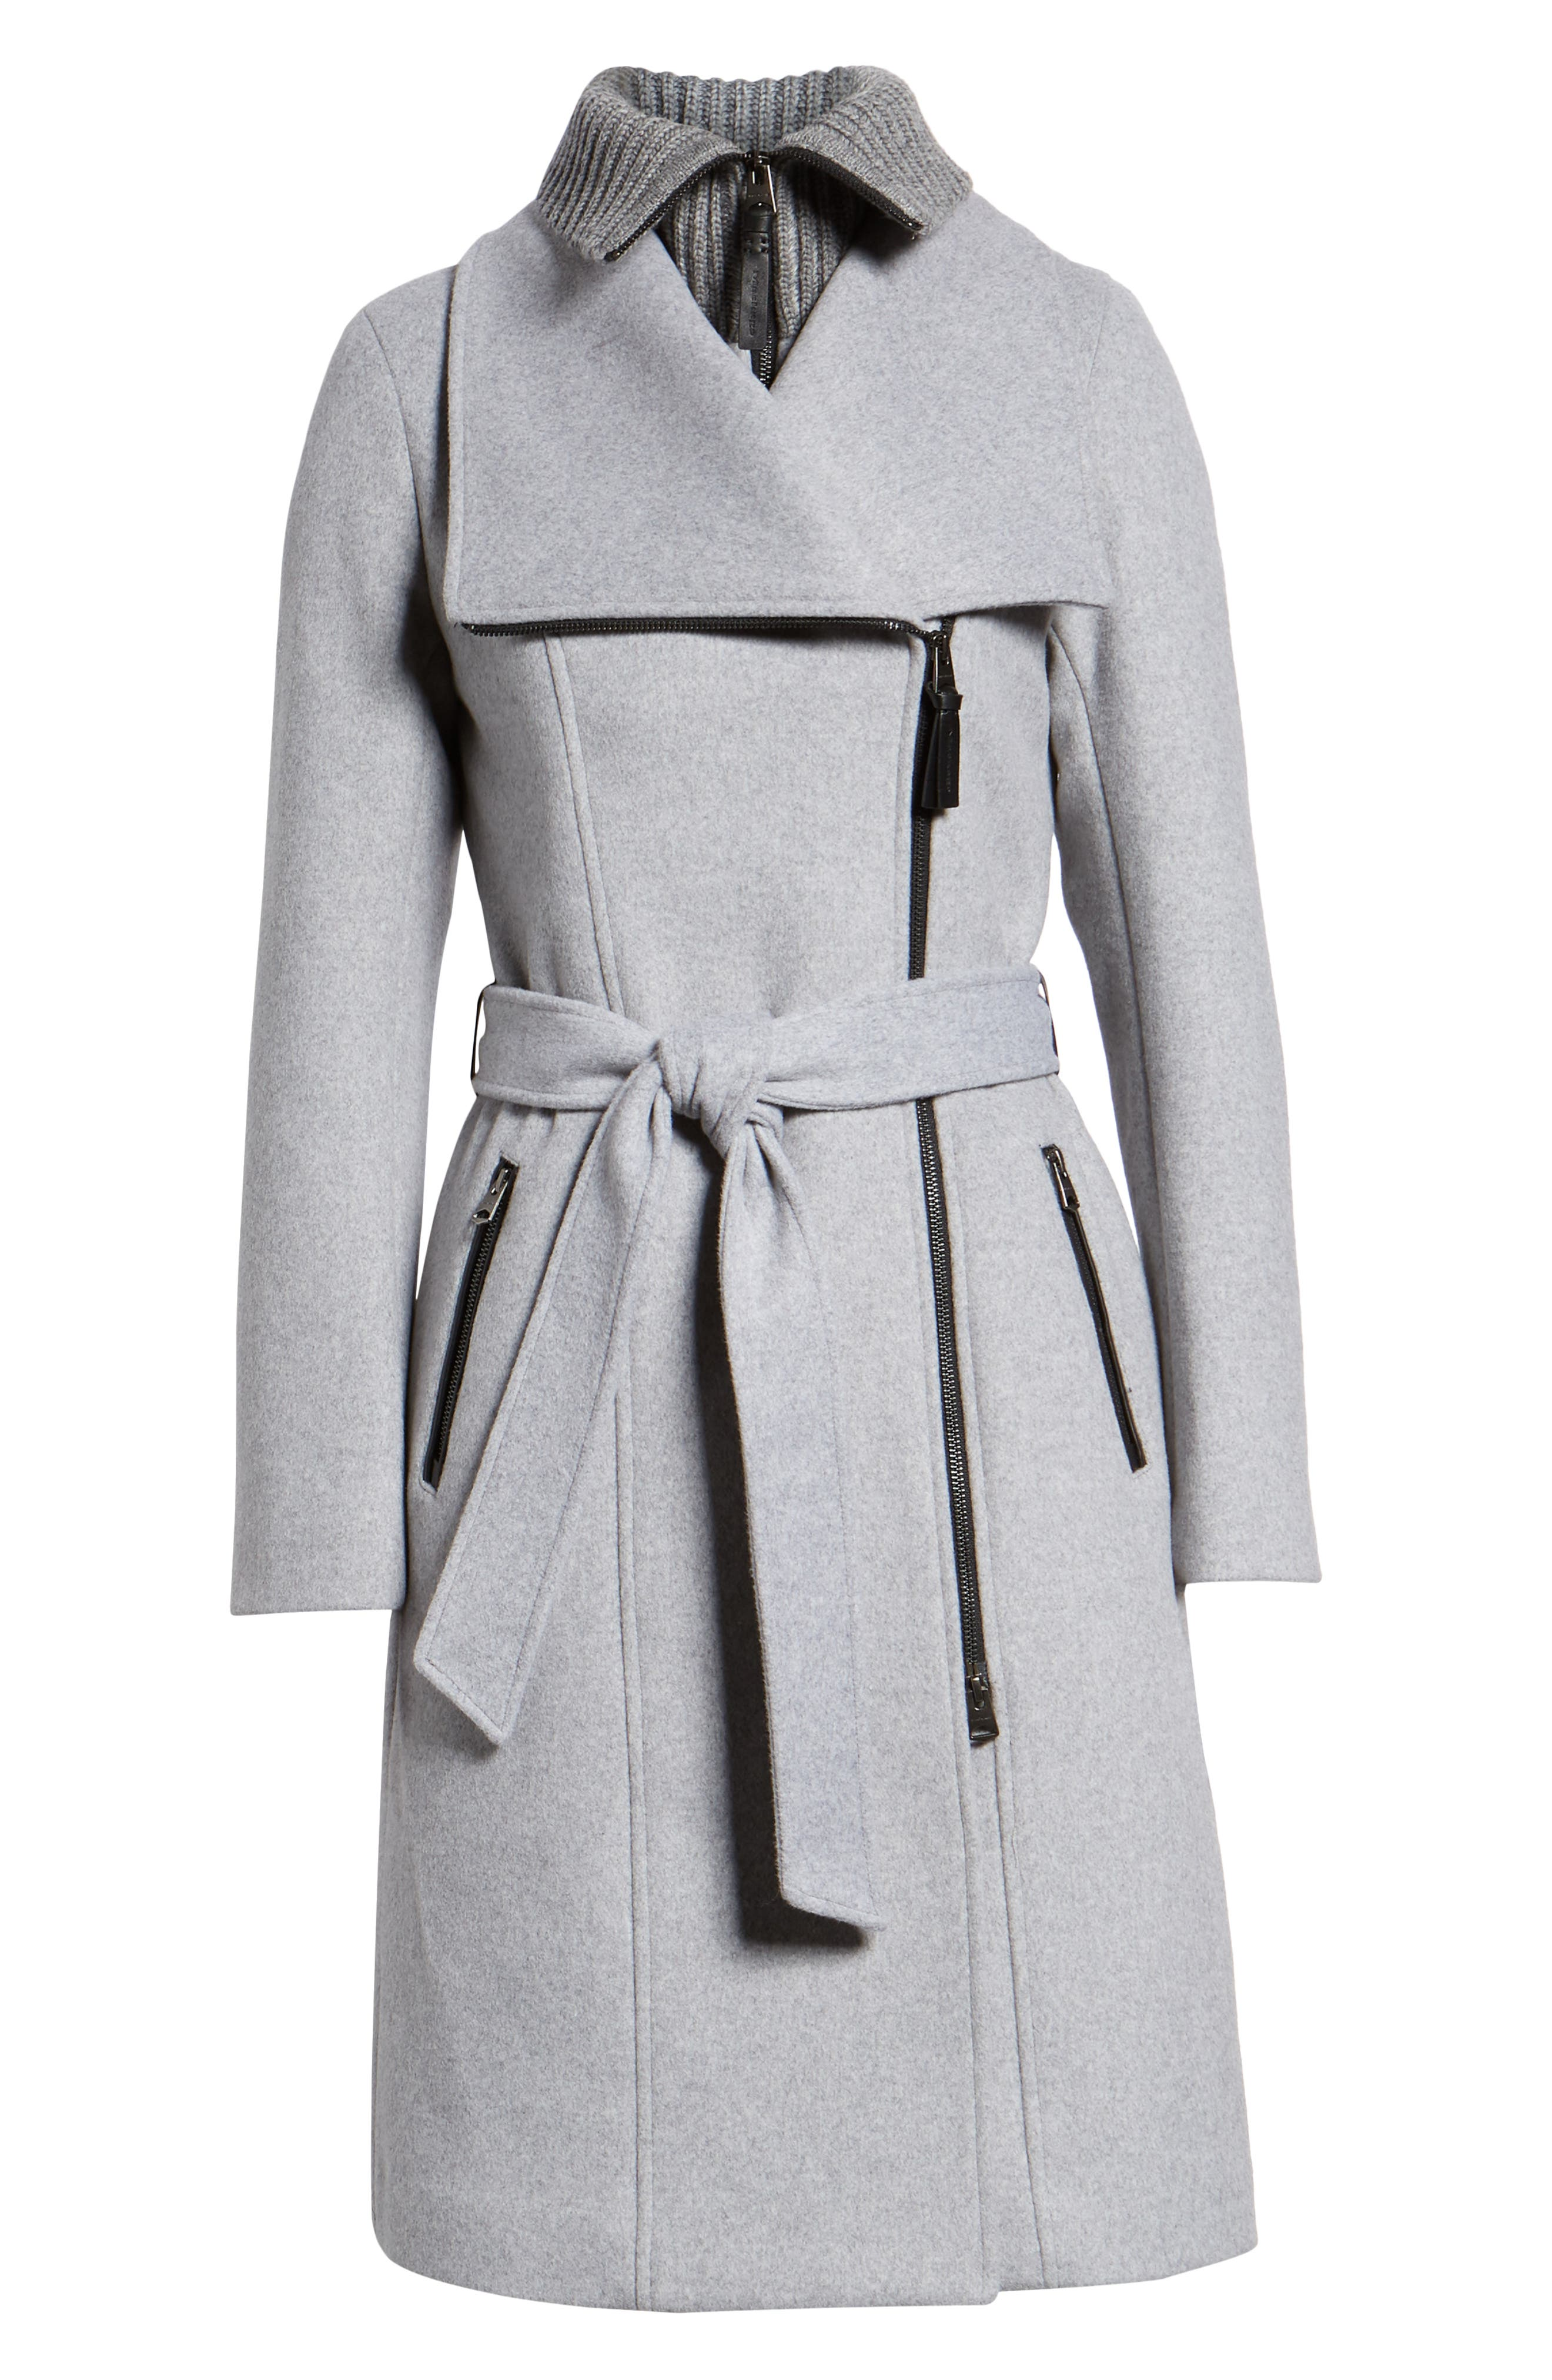 MACKAGE, Nori Belted Wool Blend Coat, Alternate thumbnail 6, color, LIGHT GREY